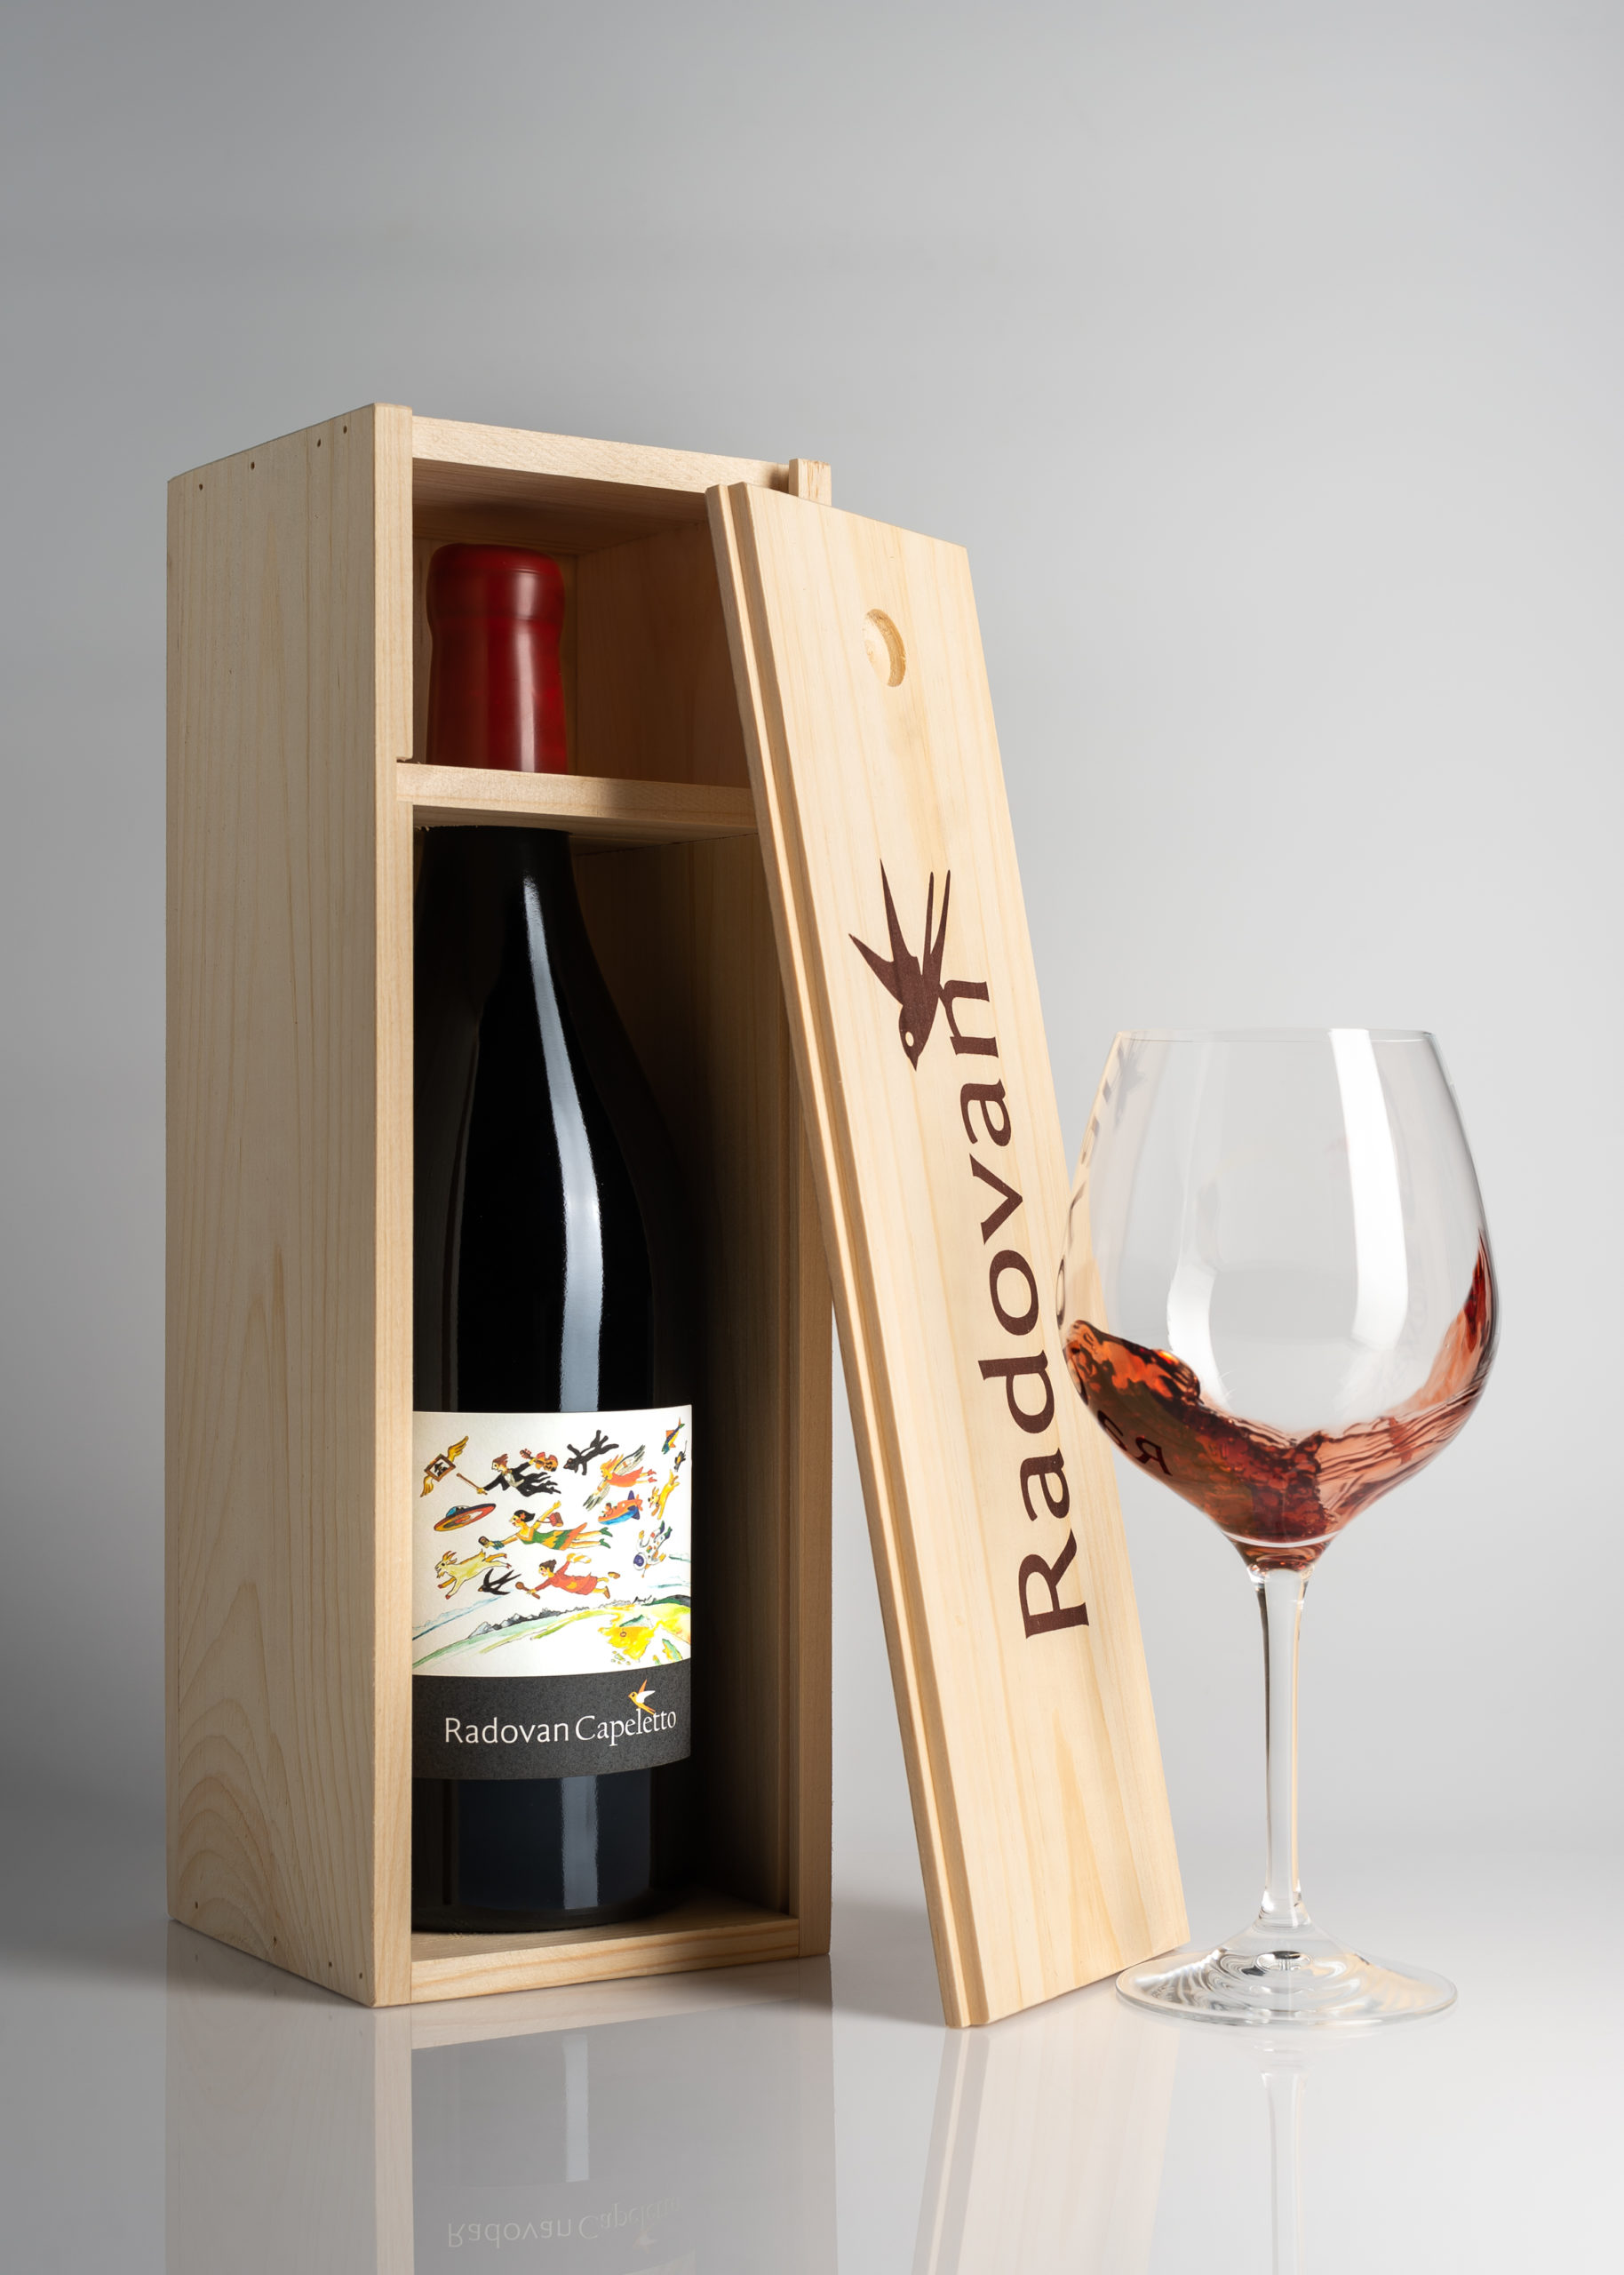 hren | plethora of creativity // Radovan winery studio product photography